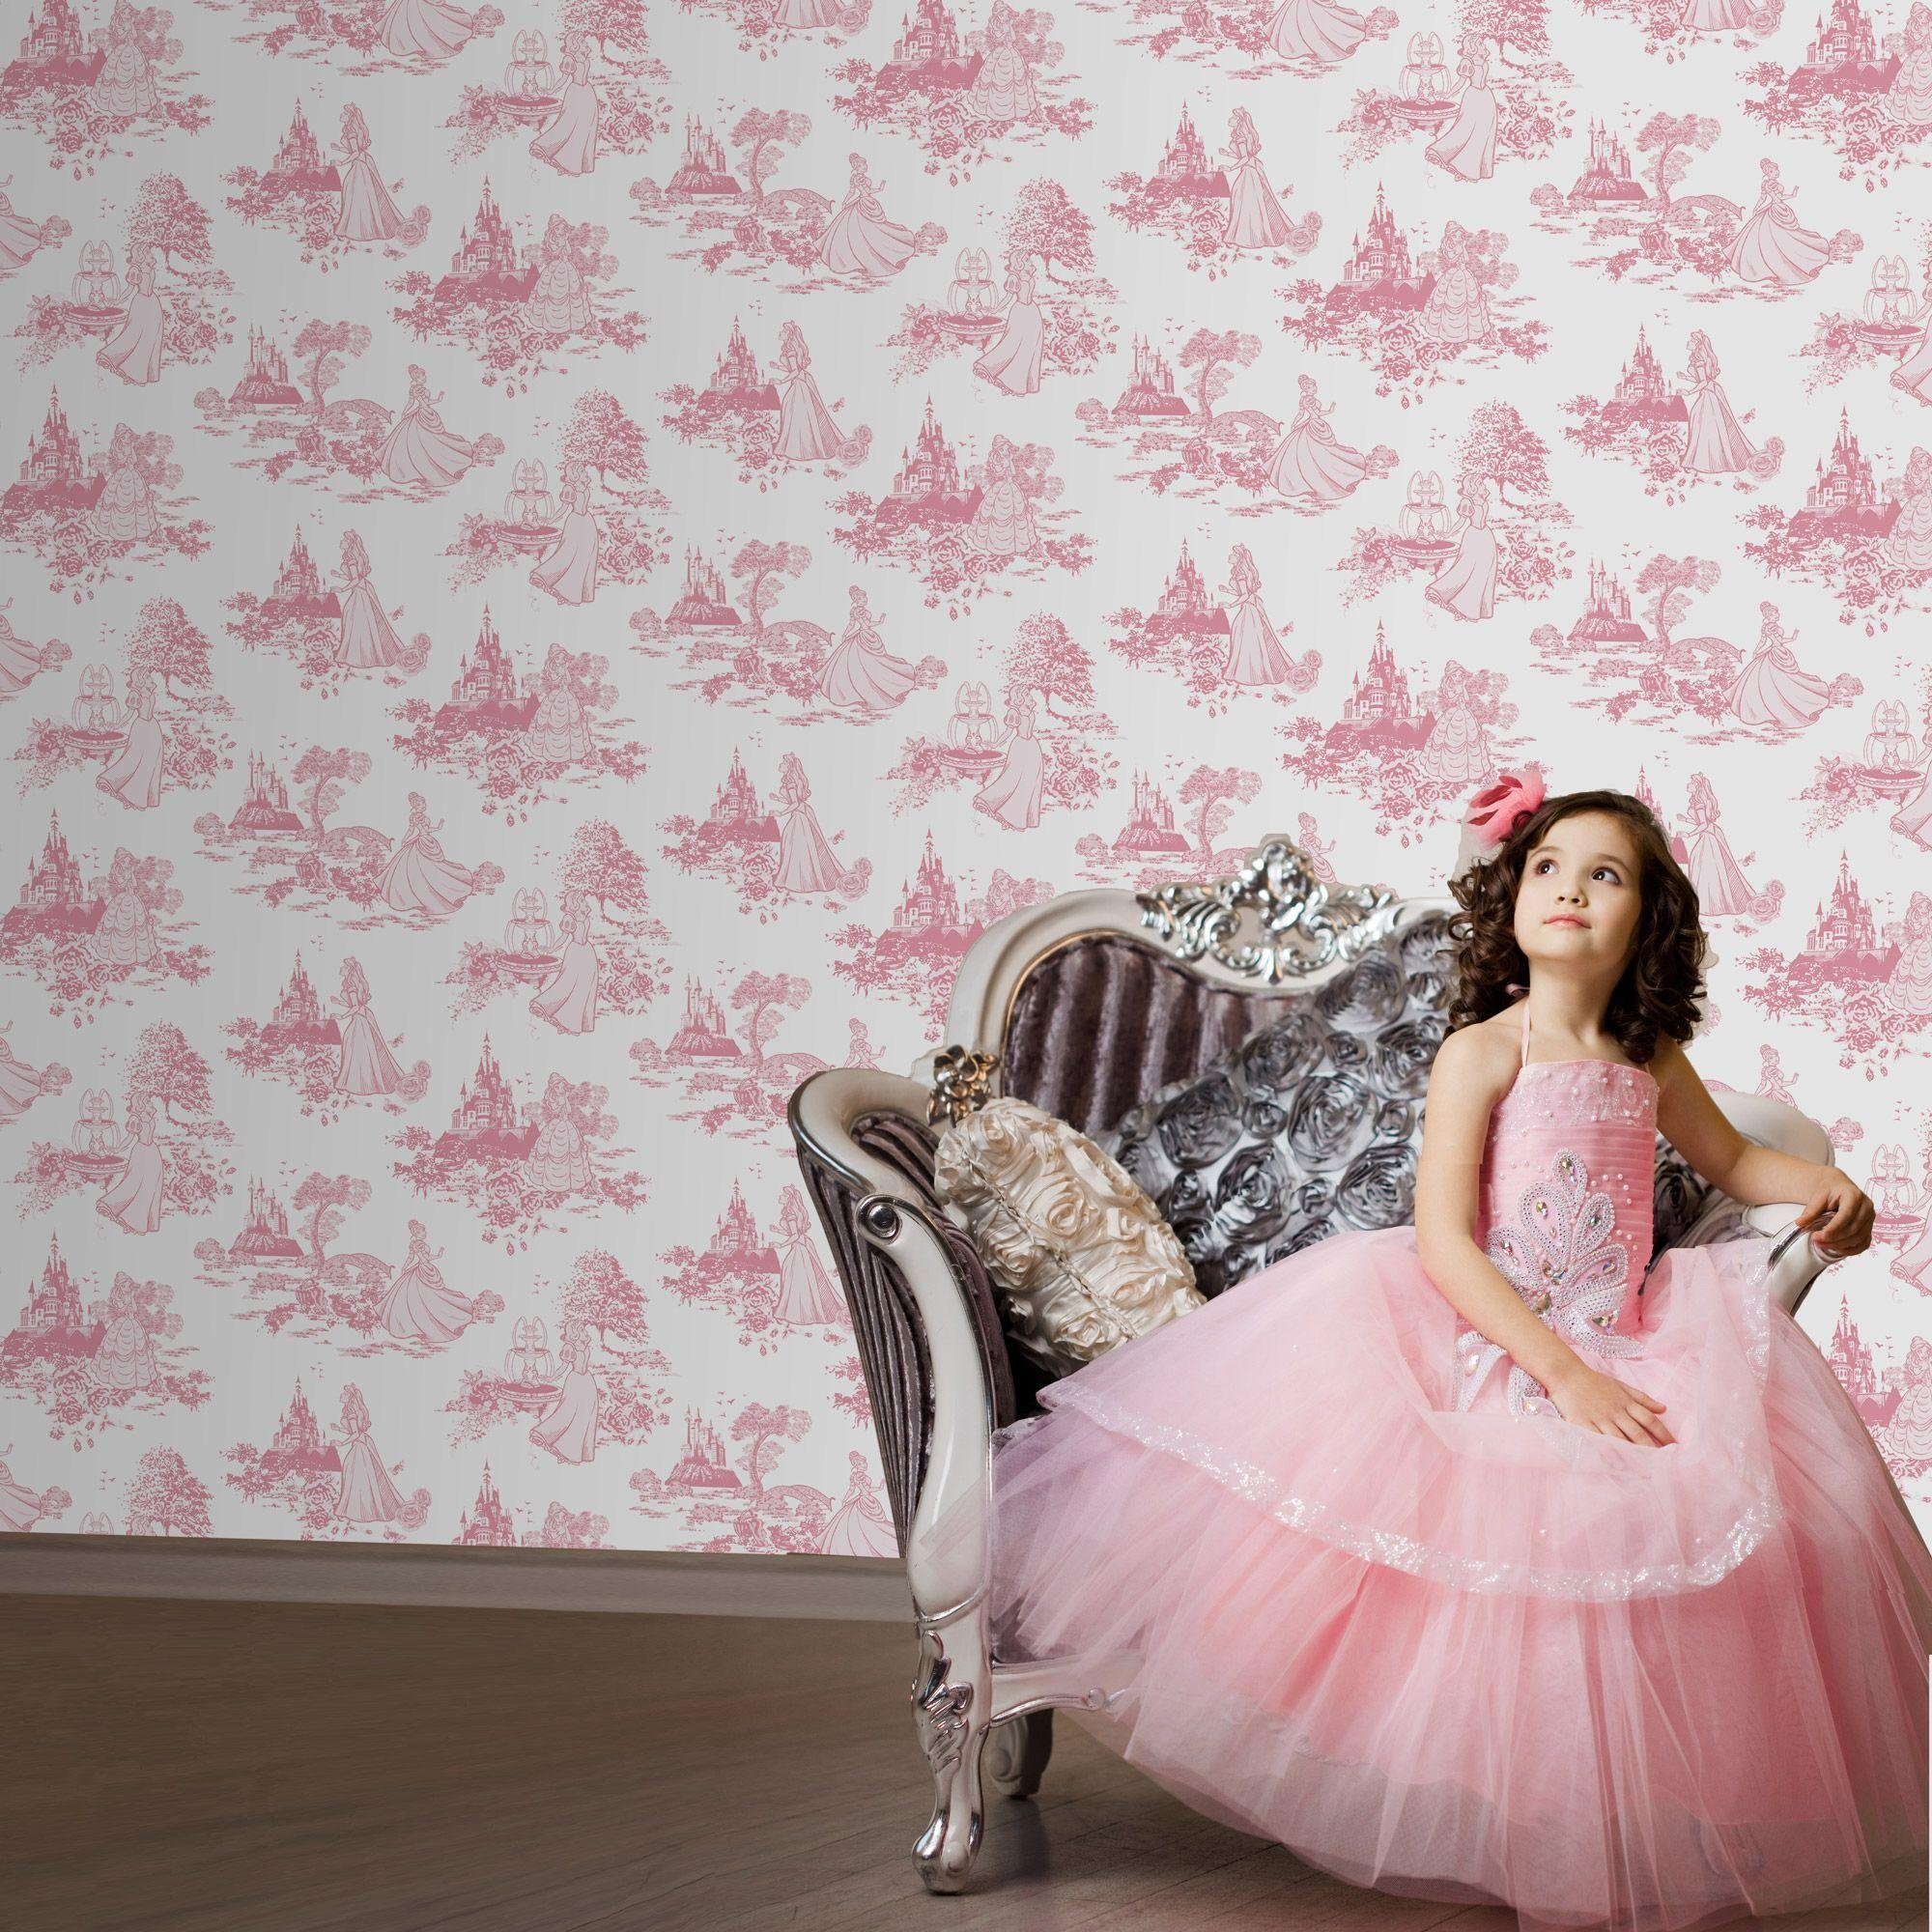 disney princess toile wallpaper  pink.